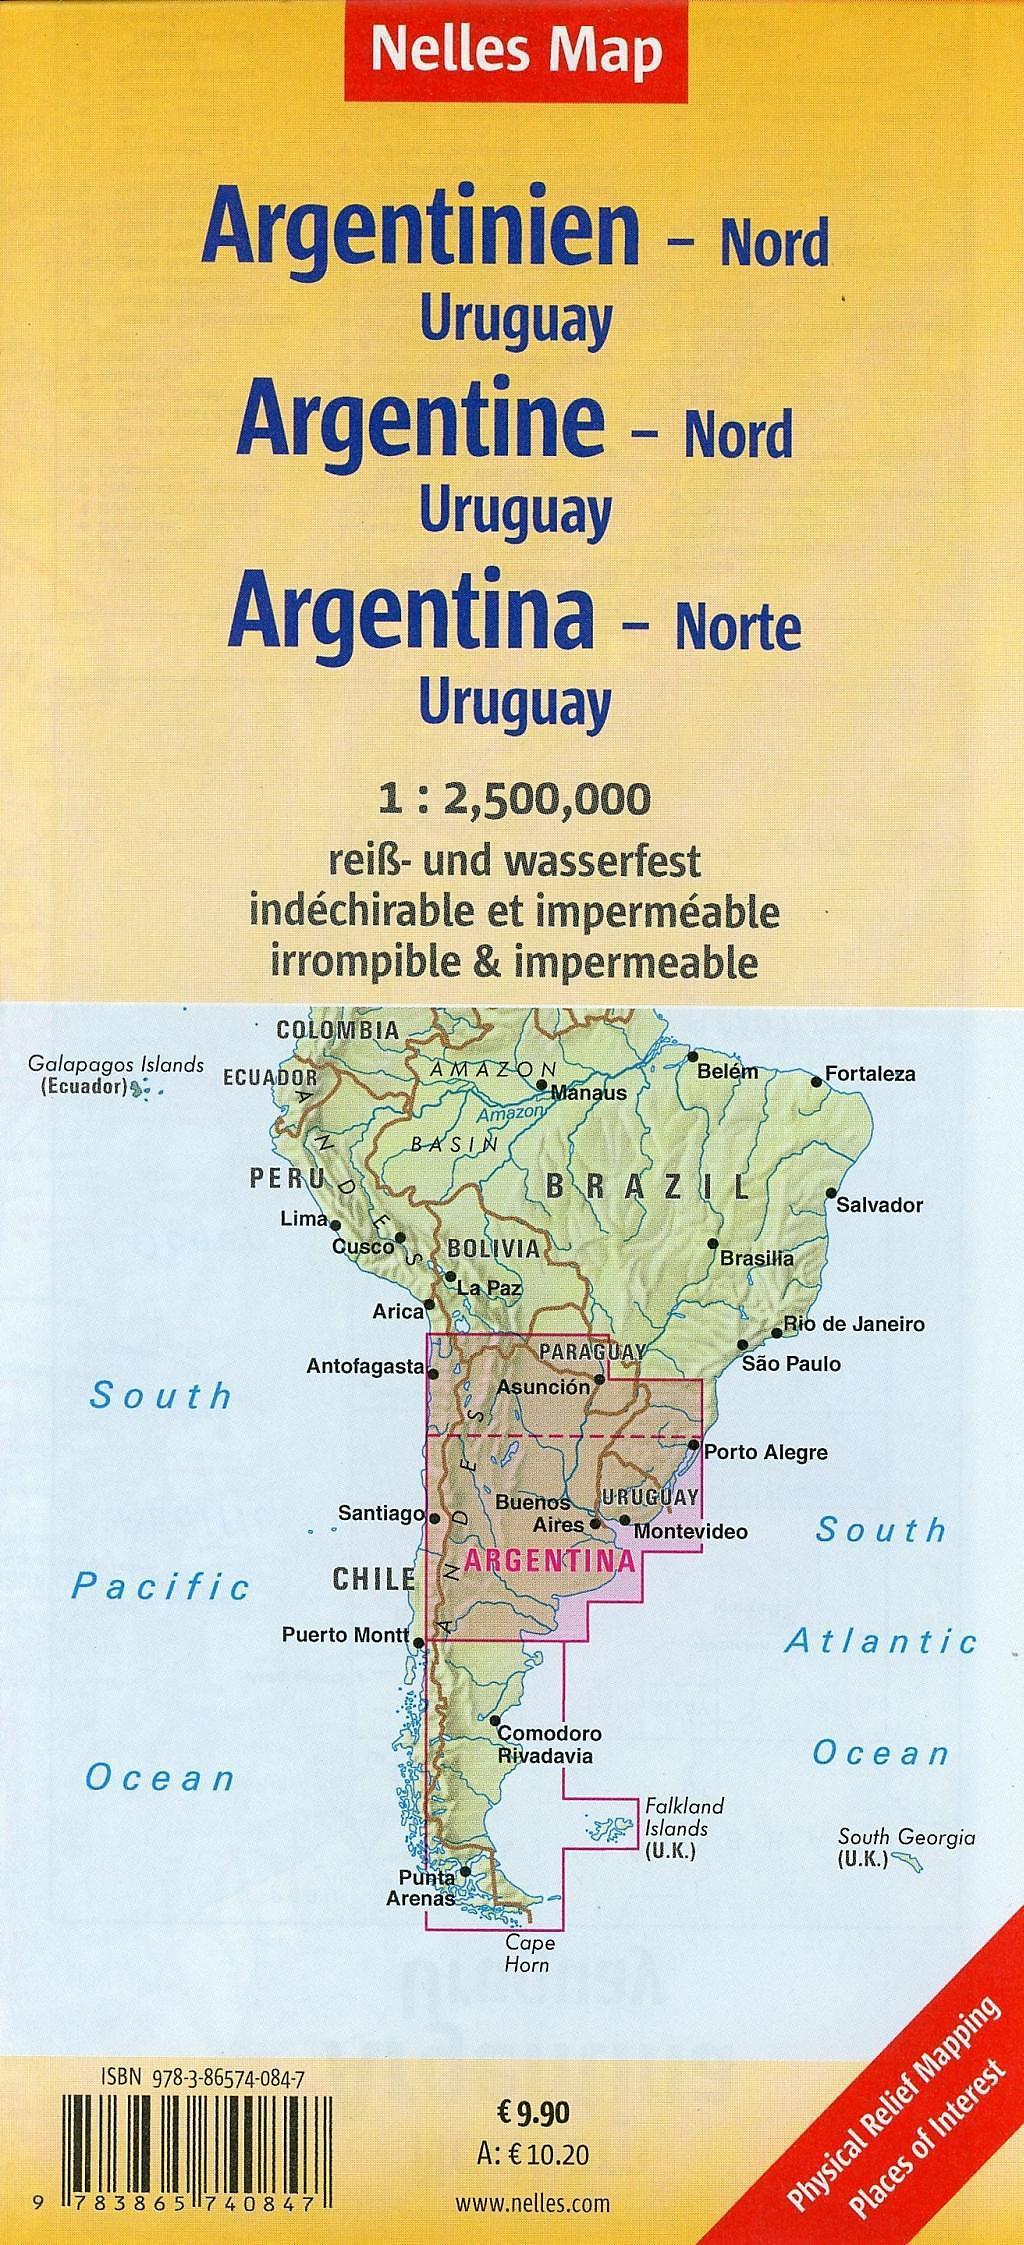 Nelles Map Landkarte Argentina: North, Uruguay Buch ...